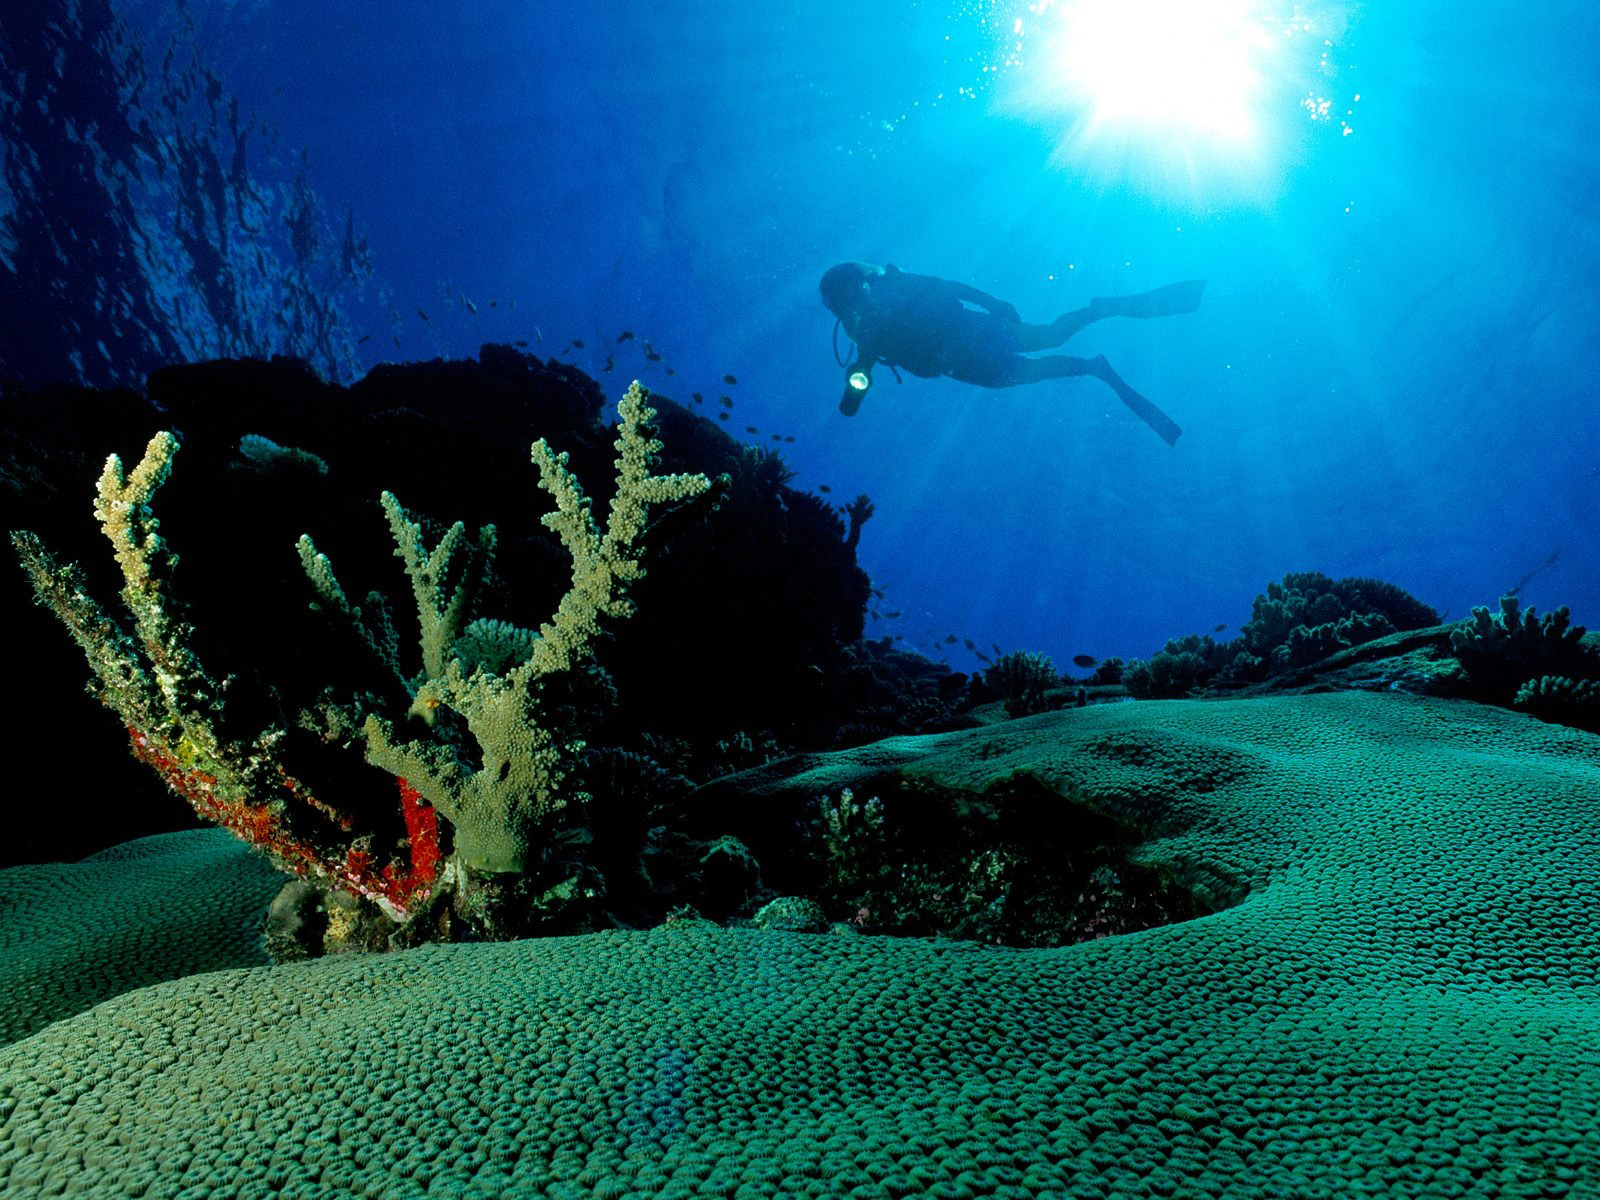 http://3.bp.blogspot.com/-AivFQCAQU3Q/TVqq0ydyHyI/AAAAAAAAAxQ/LUZaHCJR_MA/s1600/Underwater+Wallpaper+%252824%2529.jpg